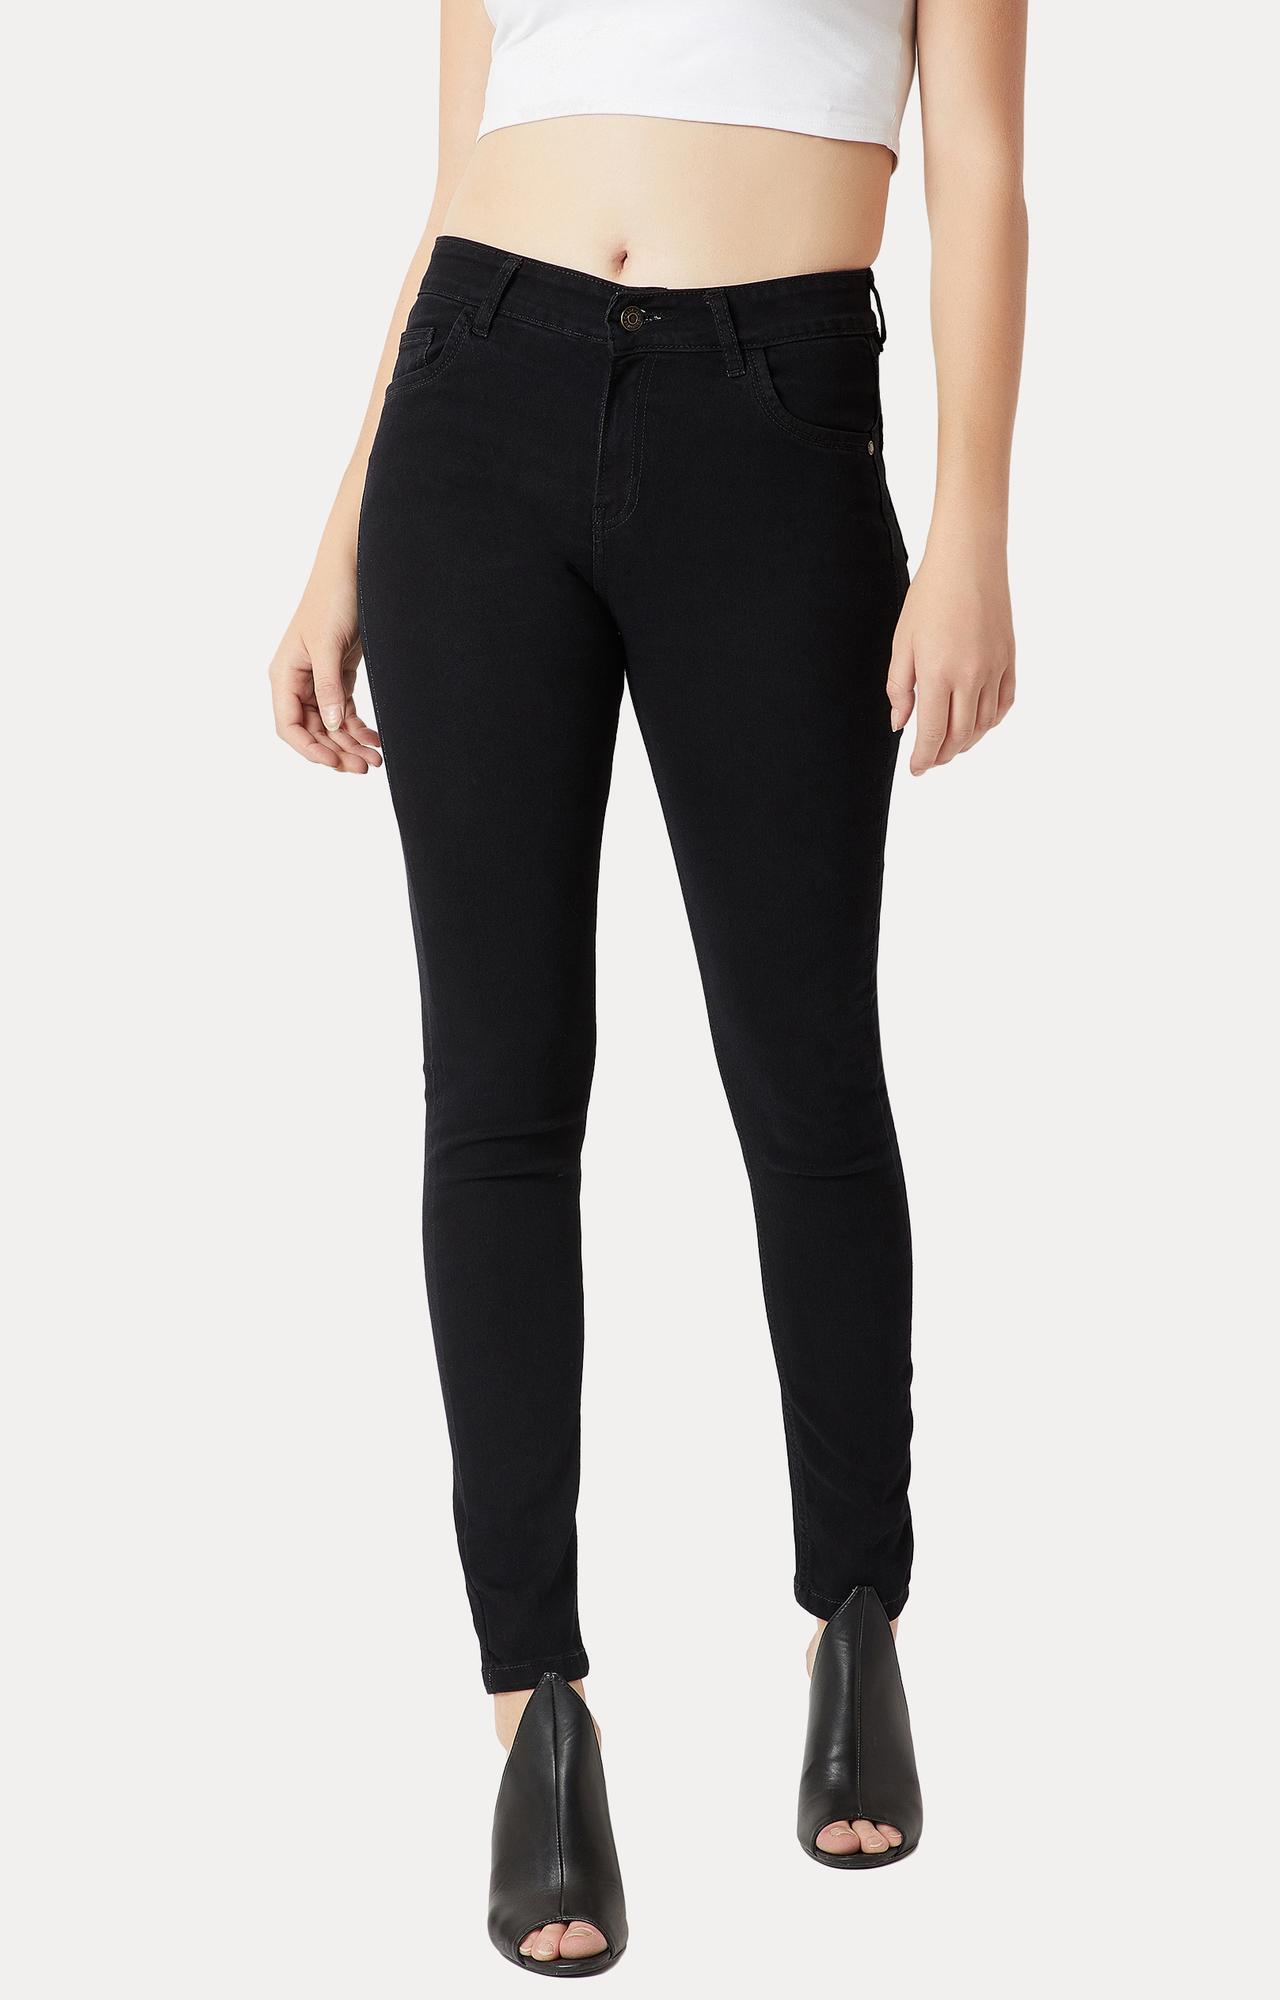 Black High Rise Acid Wash Stretchable Jeans